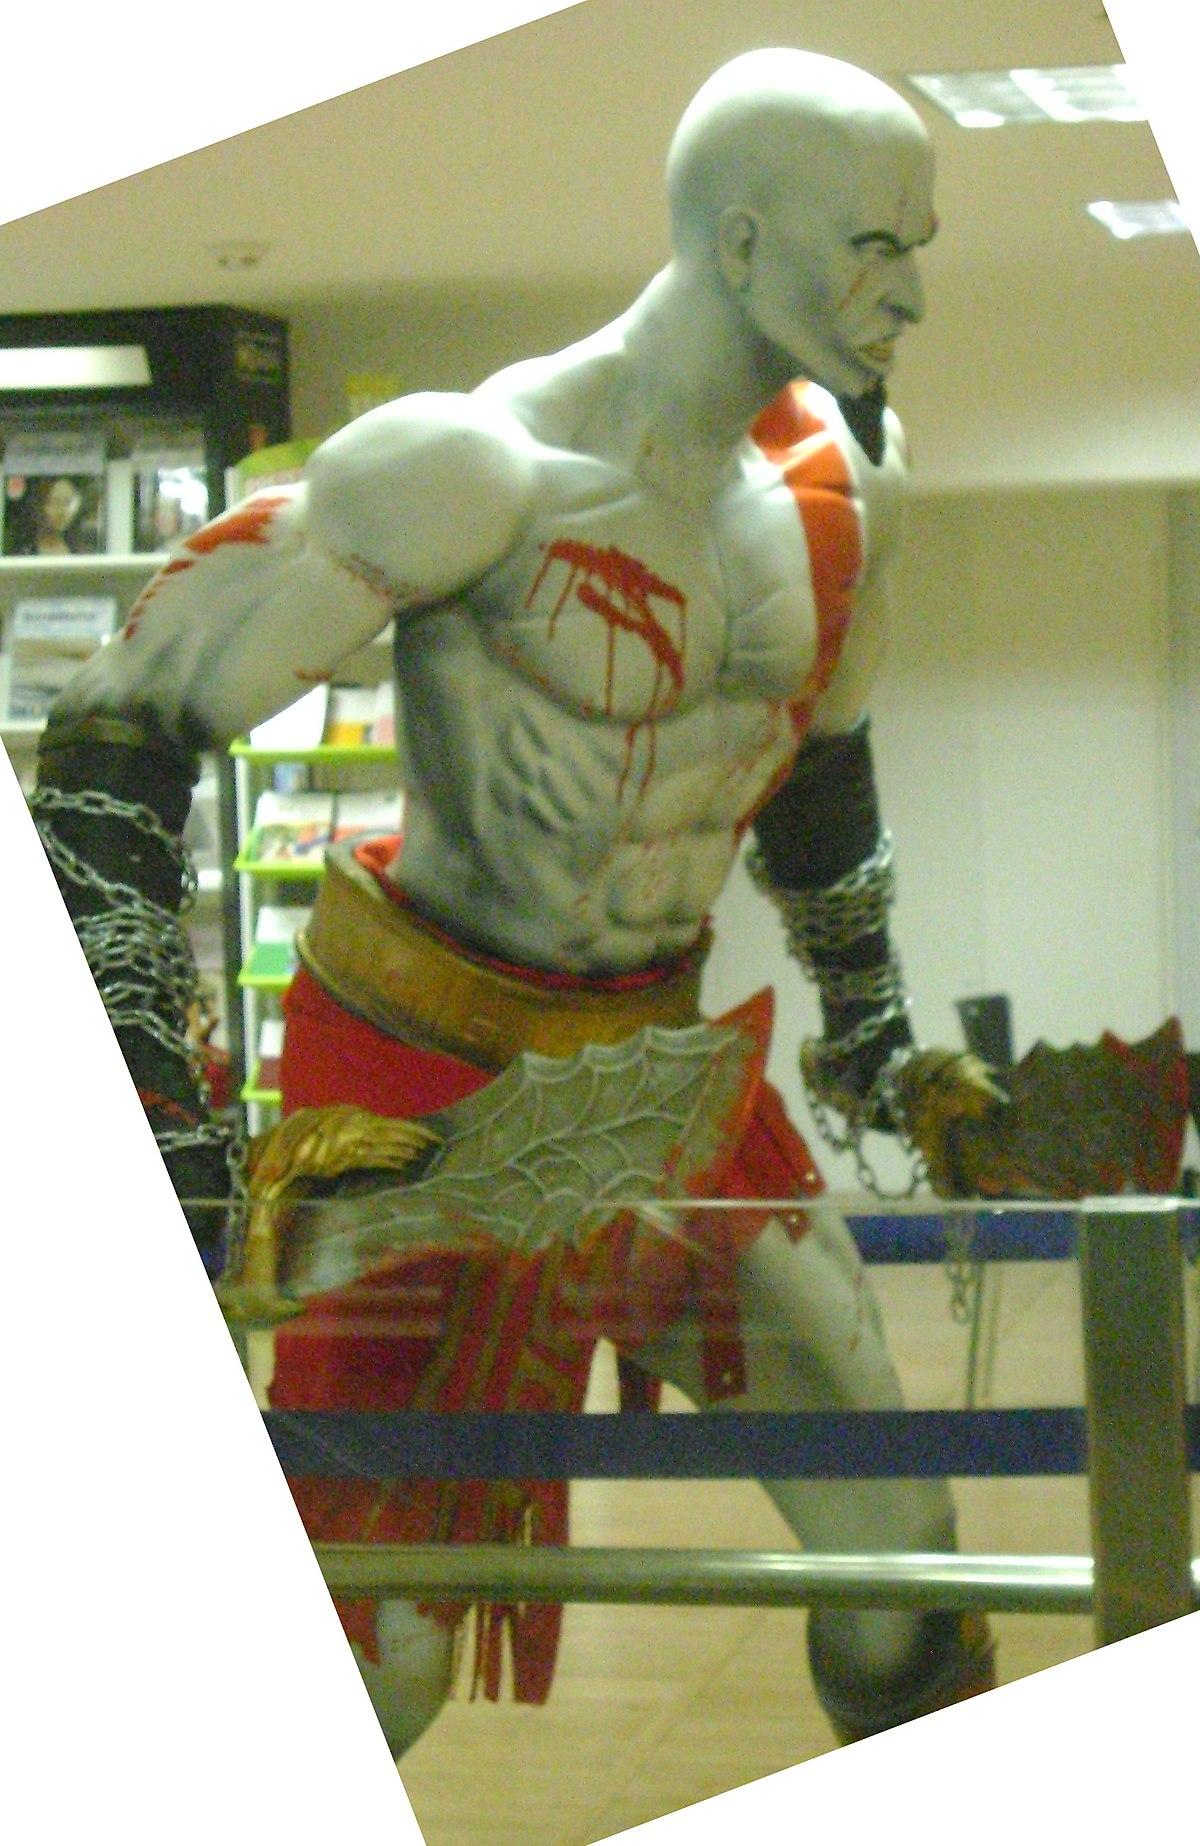 Kratos Personaje Wikipedia La Enciclopedia Libre